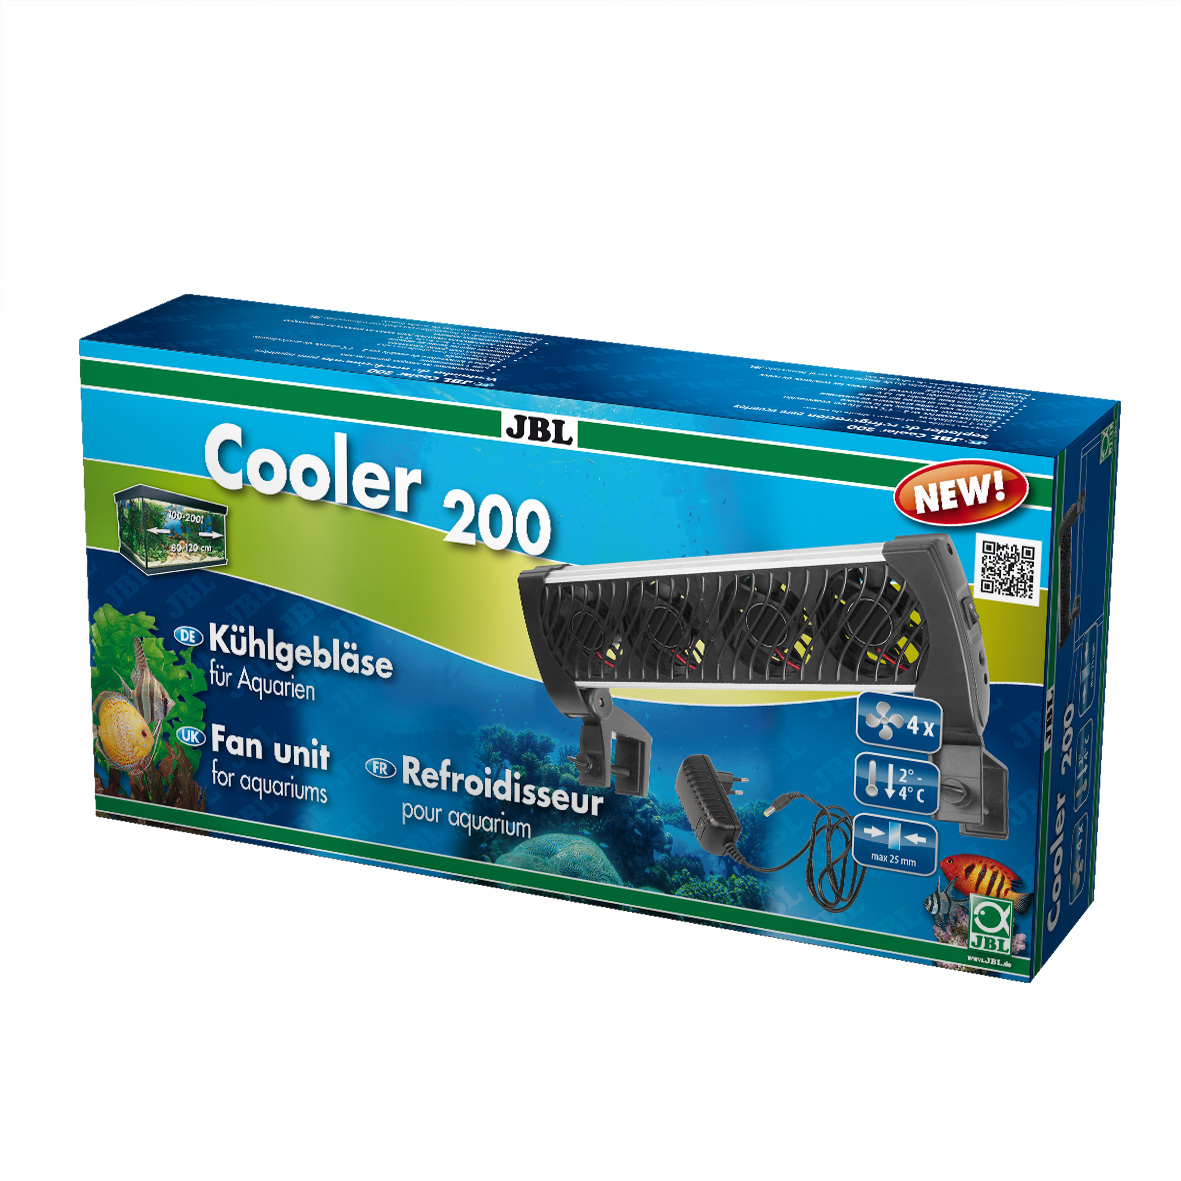 JBL Cooler 200 6044100